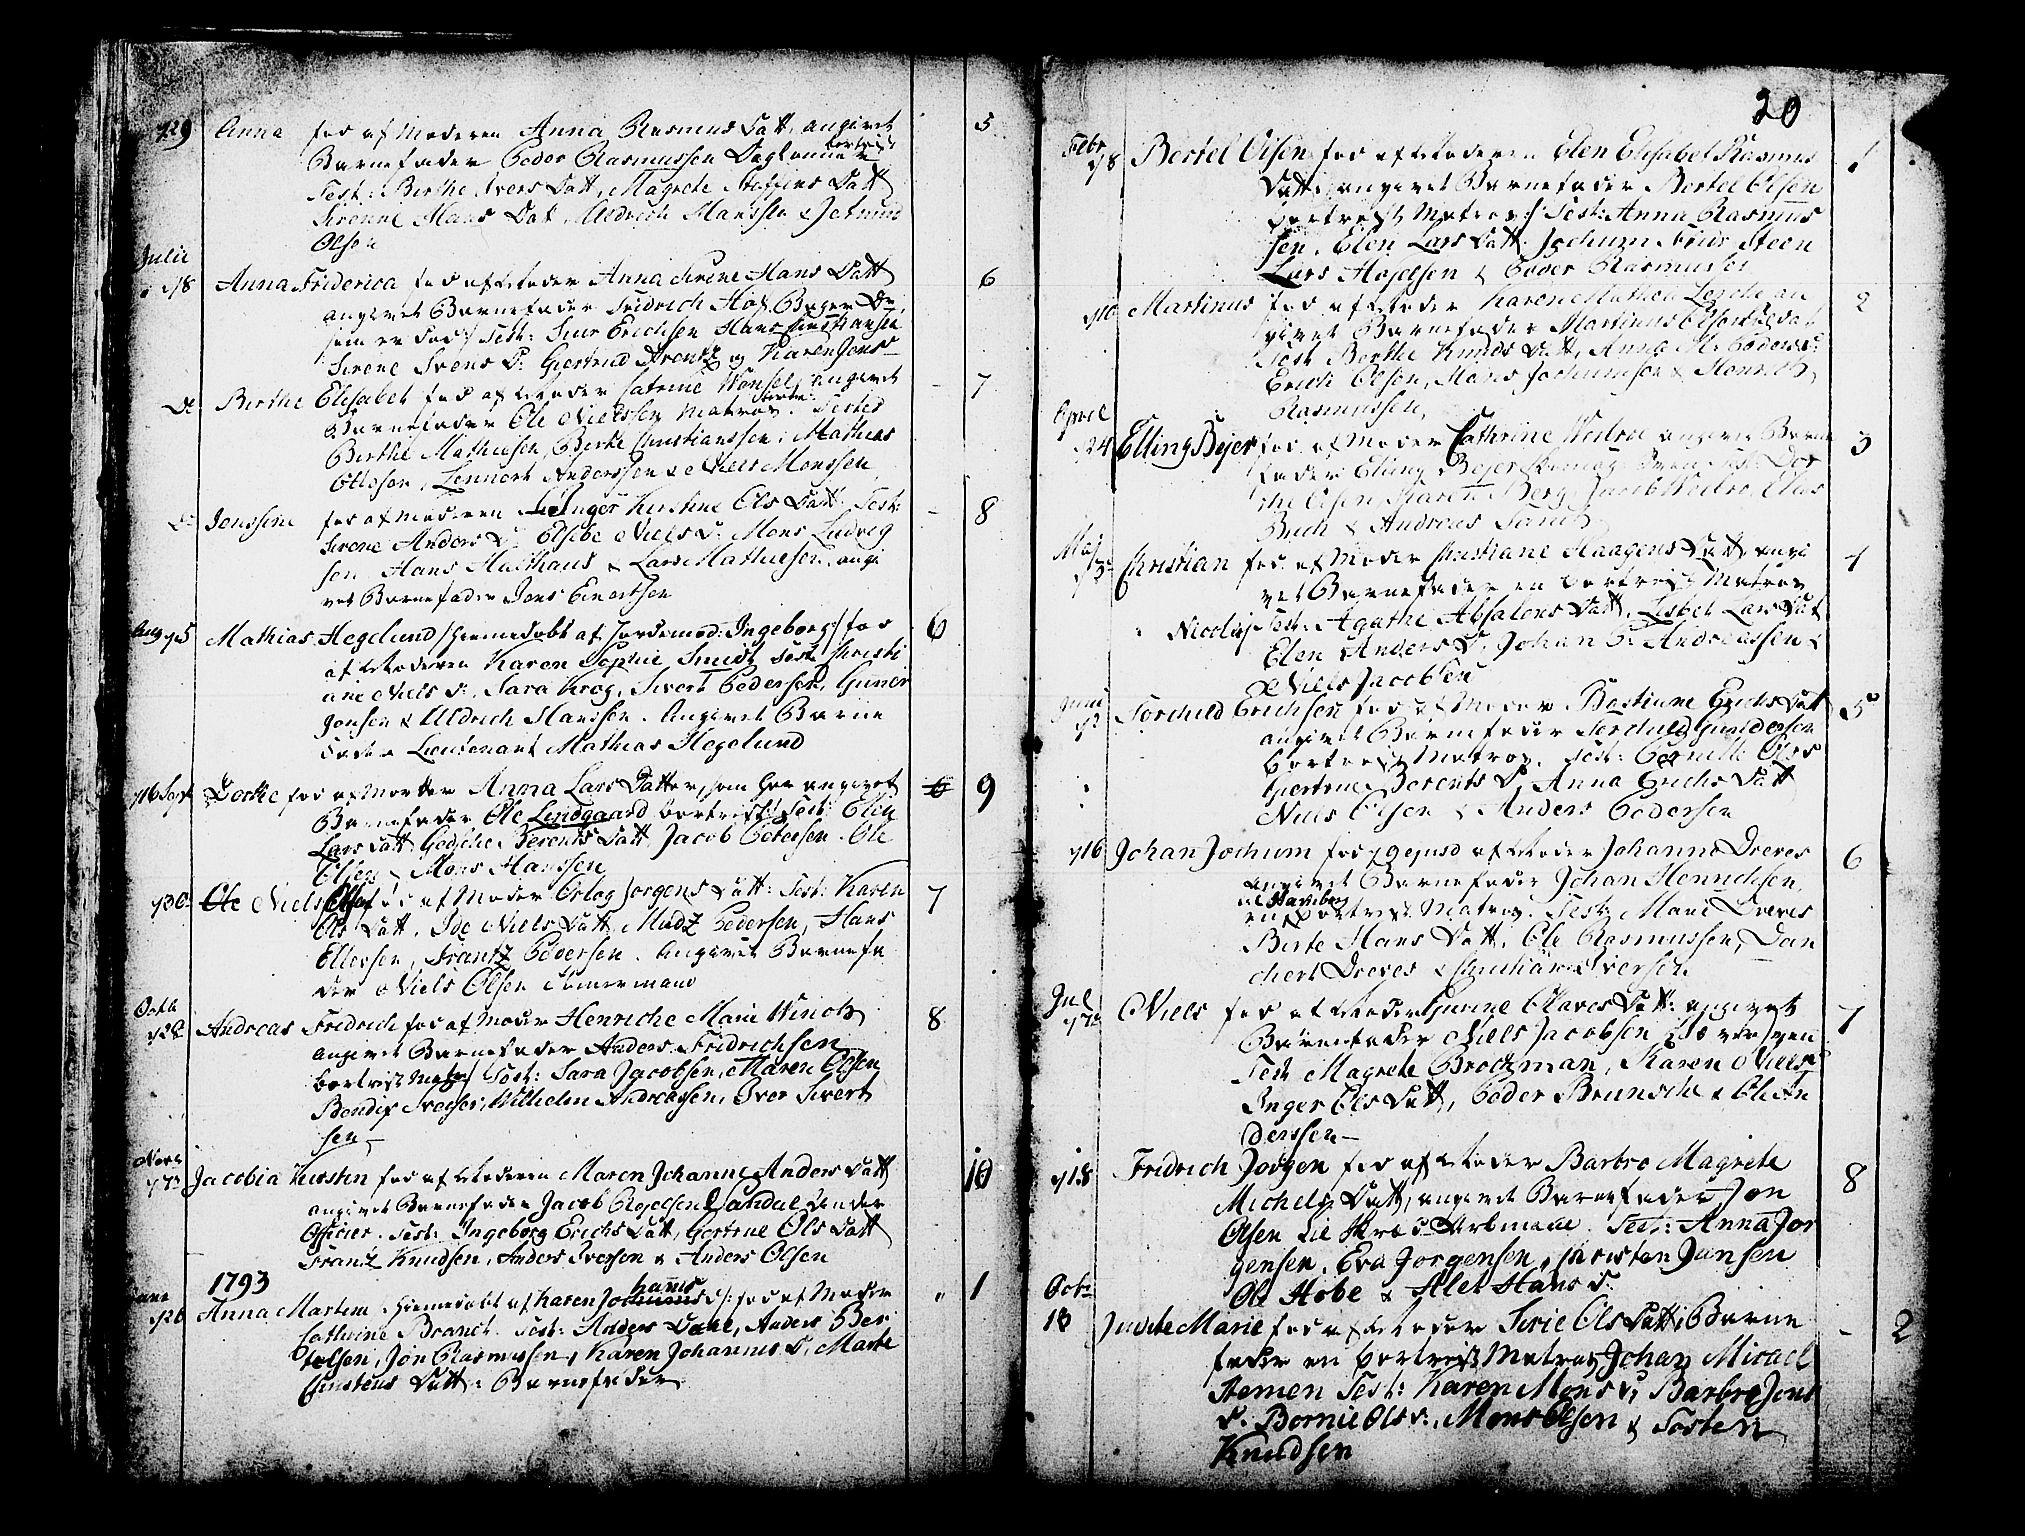 SAB, Domkirken Sokneprestembete, H/Haa/L0003: Ministerialbok nr. A 3, 1758-1789, s. 20